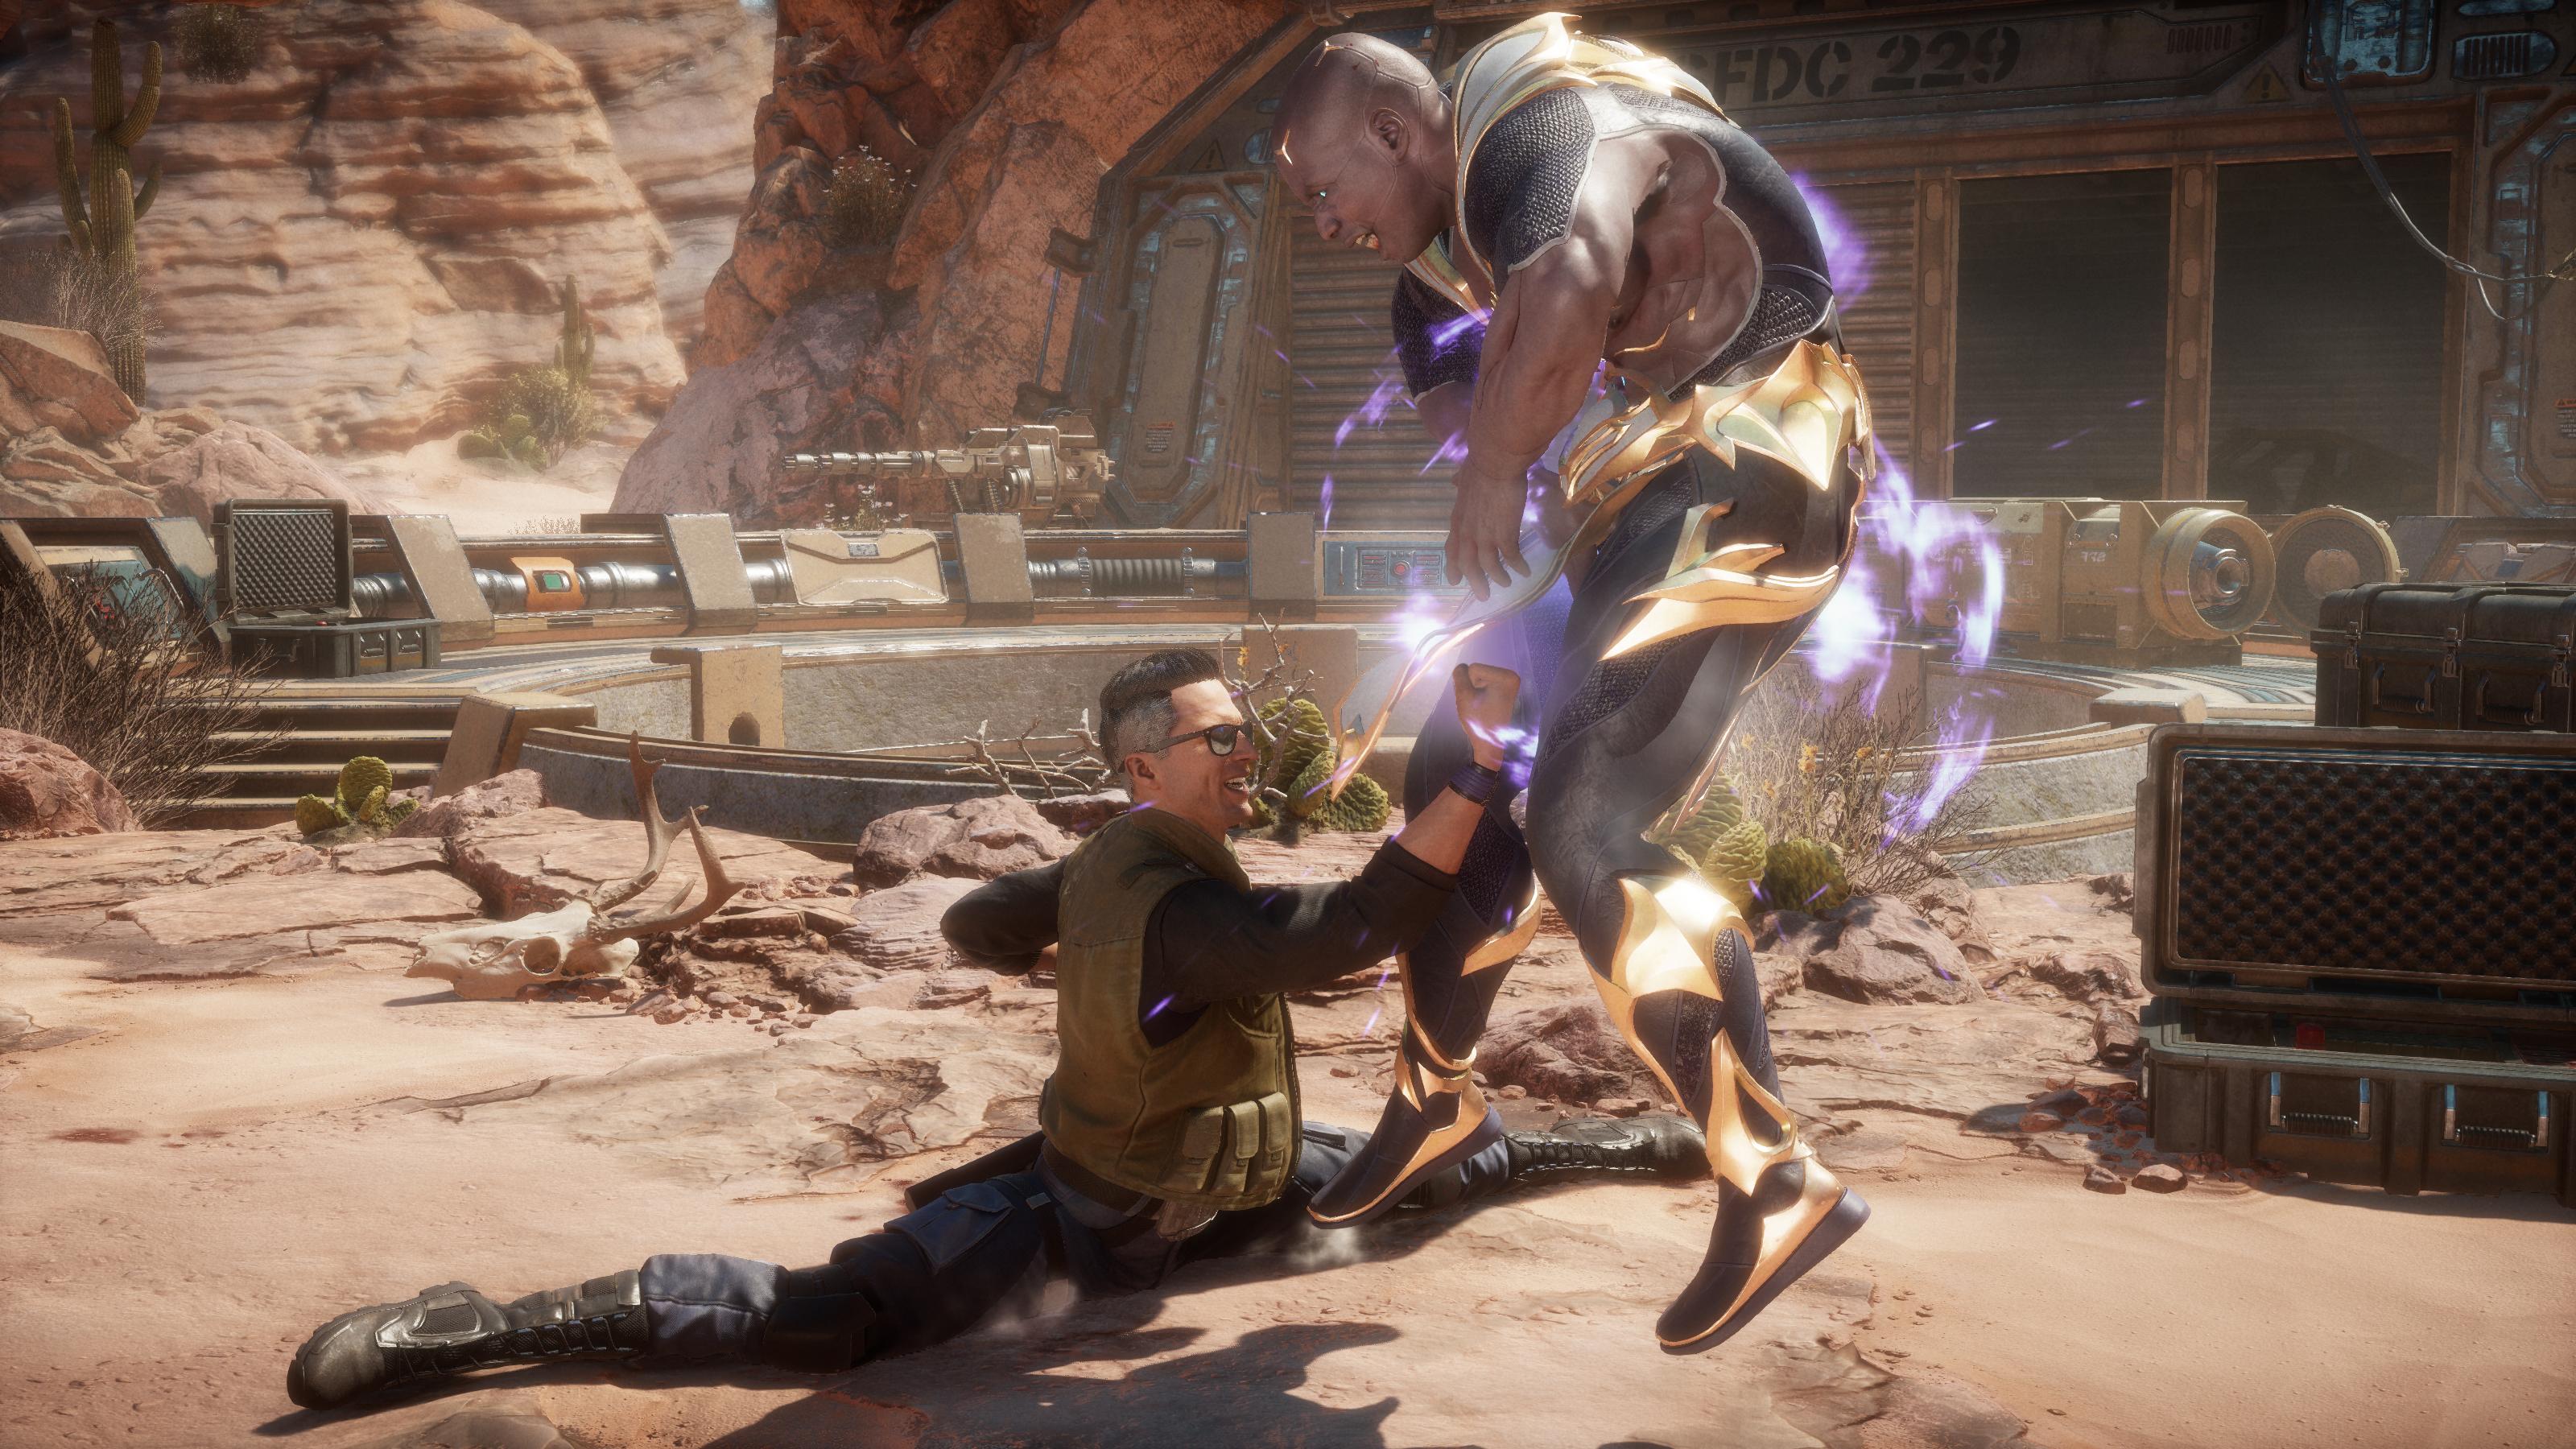 All Games Delta: Mortal Kombat 11 adds Cassie Cage, Jacqui